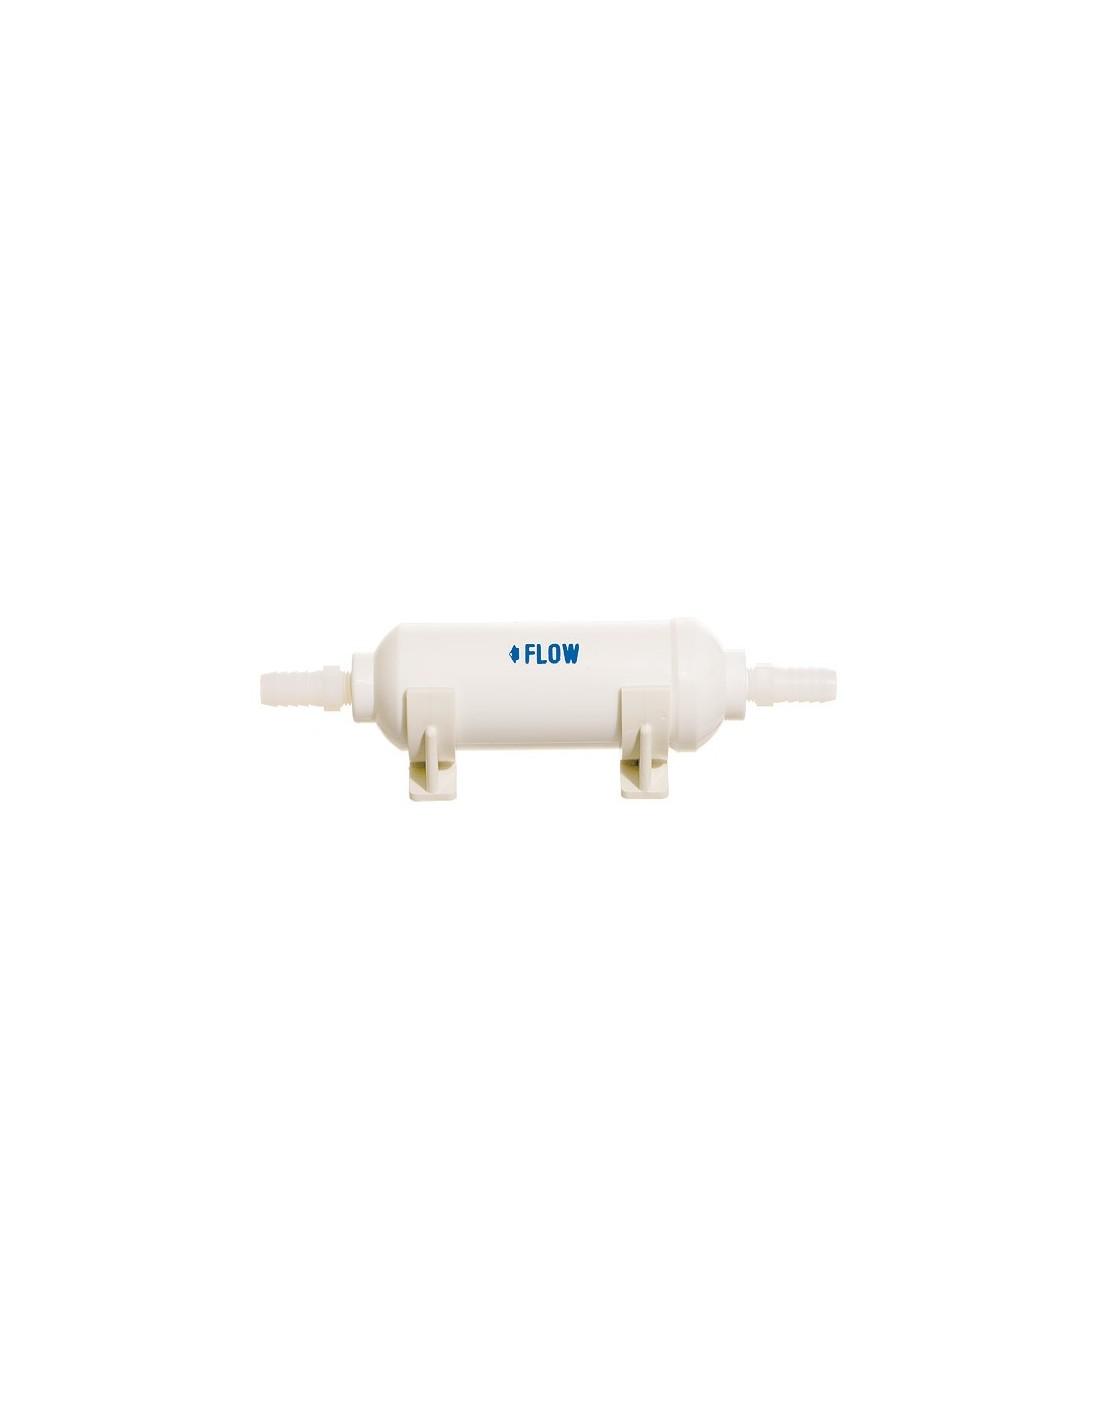 Inline Water Filter - Uitgang 13 mm - Yachticon - Onderhoud - 01.1769.00